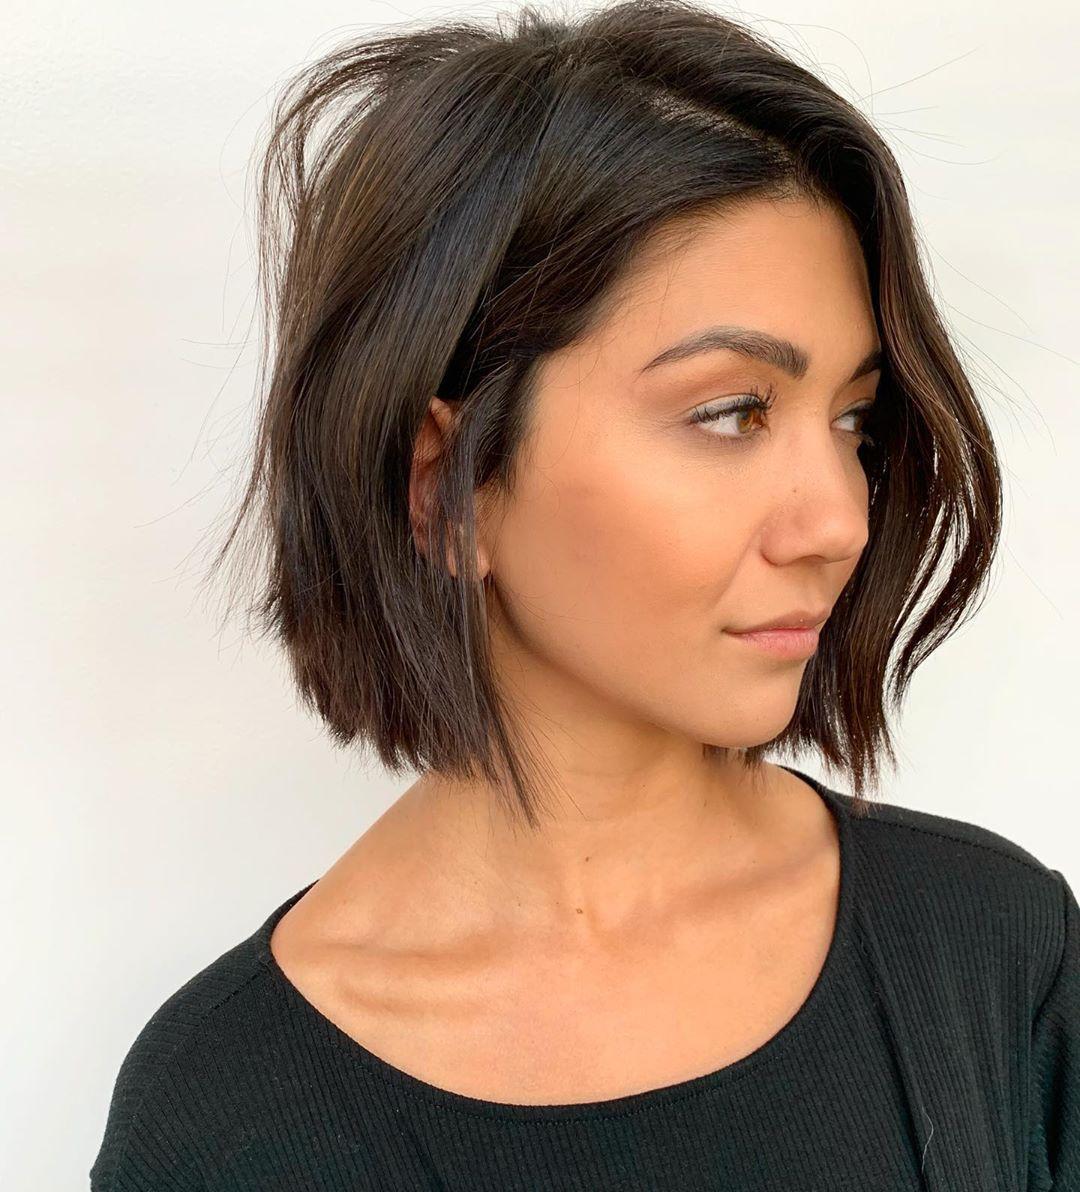 39+ High volume bob hairstyles ideas in 2021